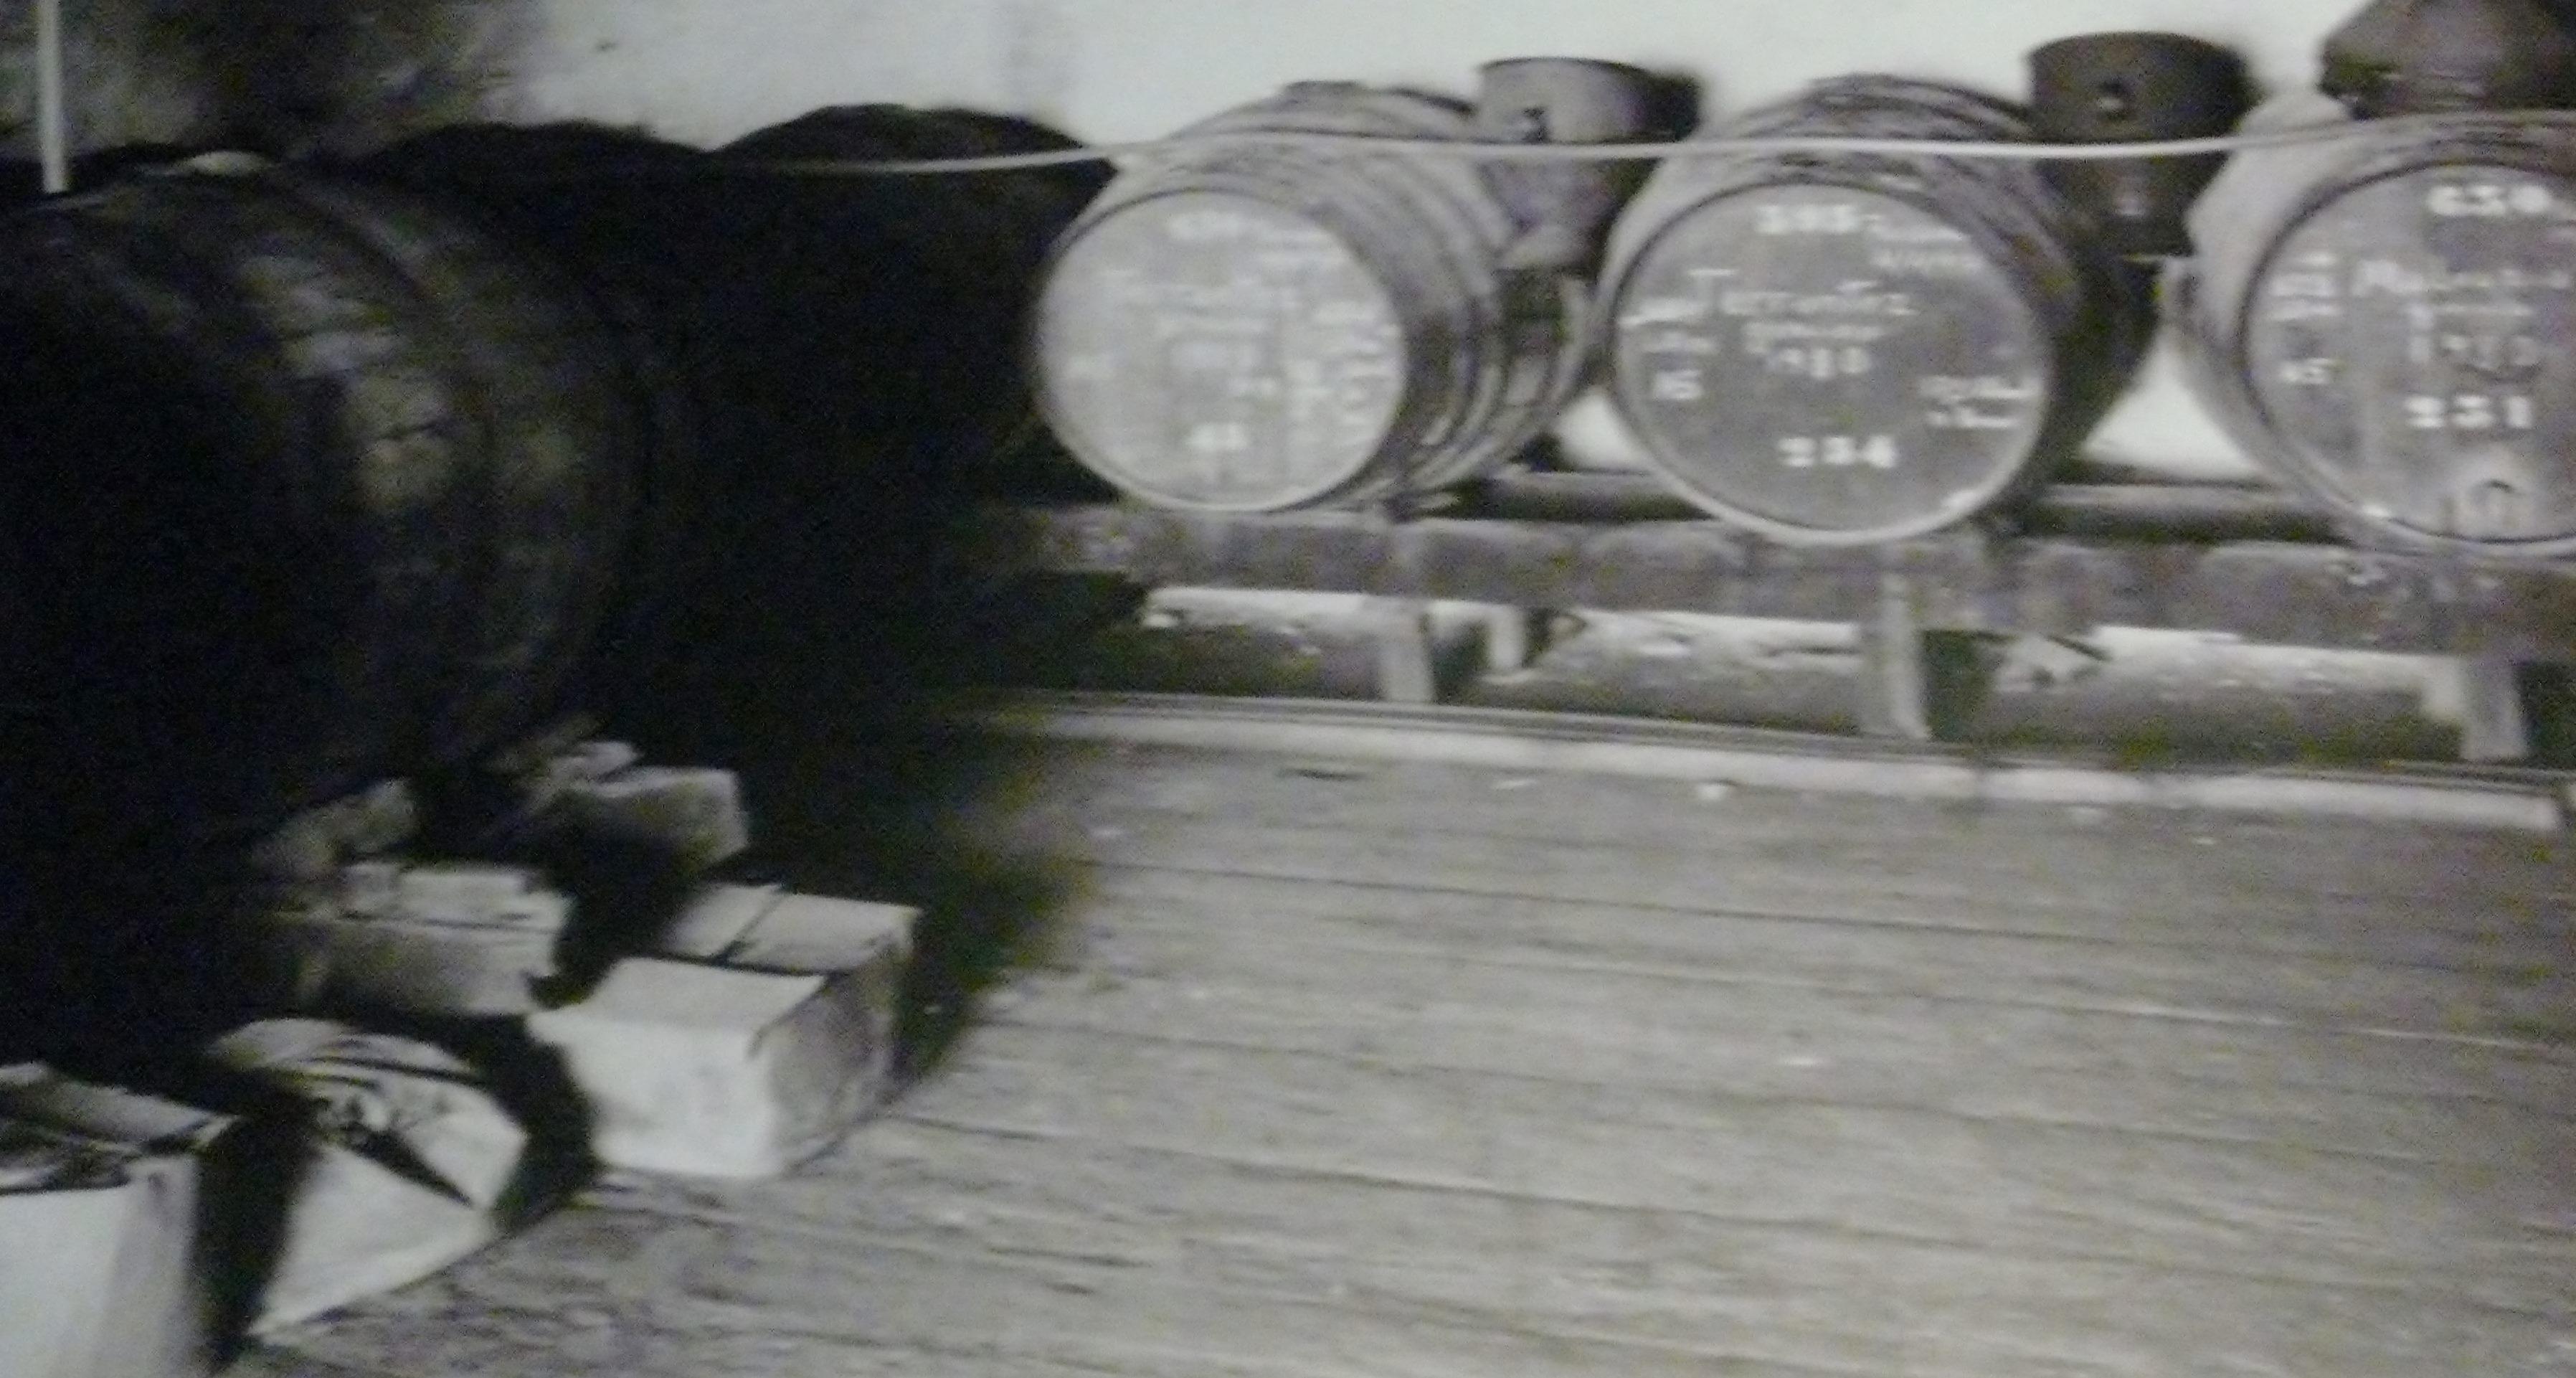 Old barrels of Madeira wine